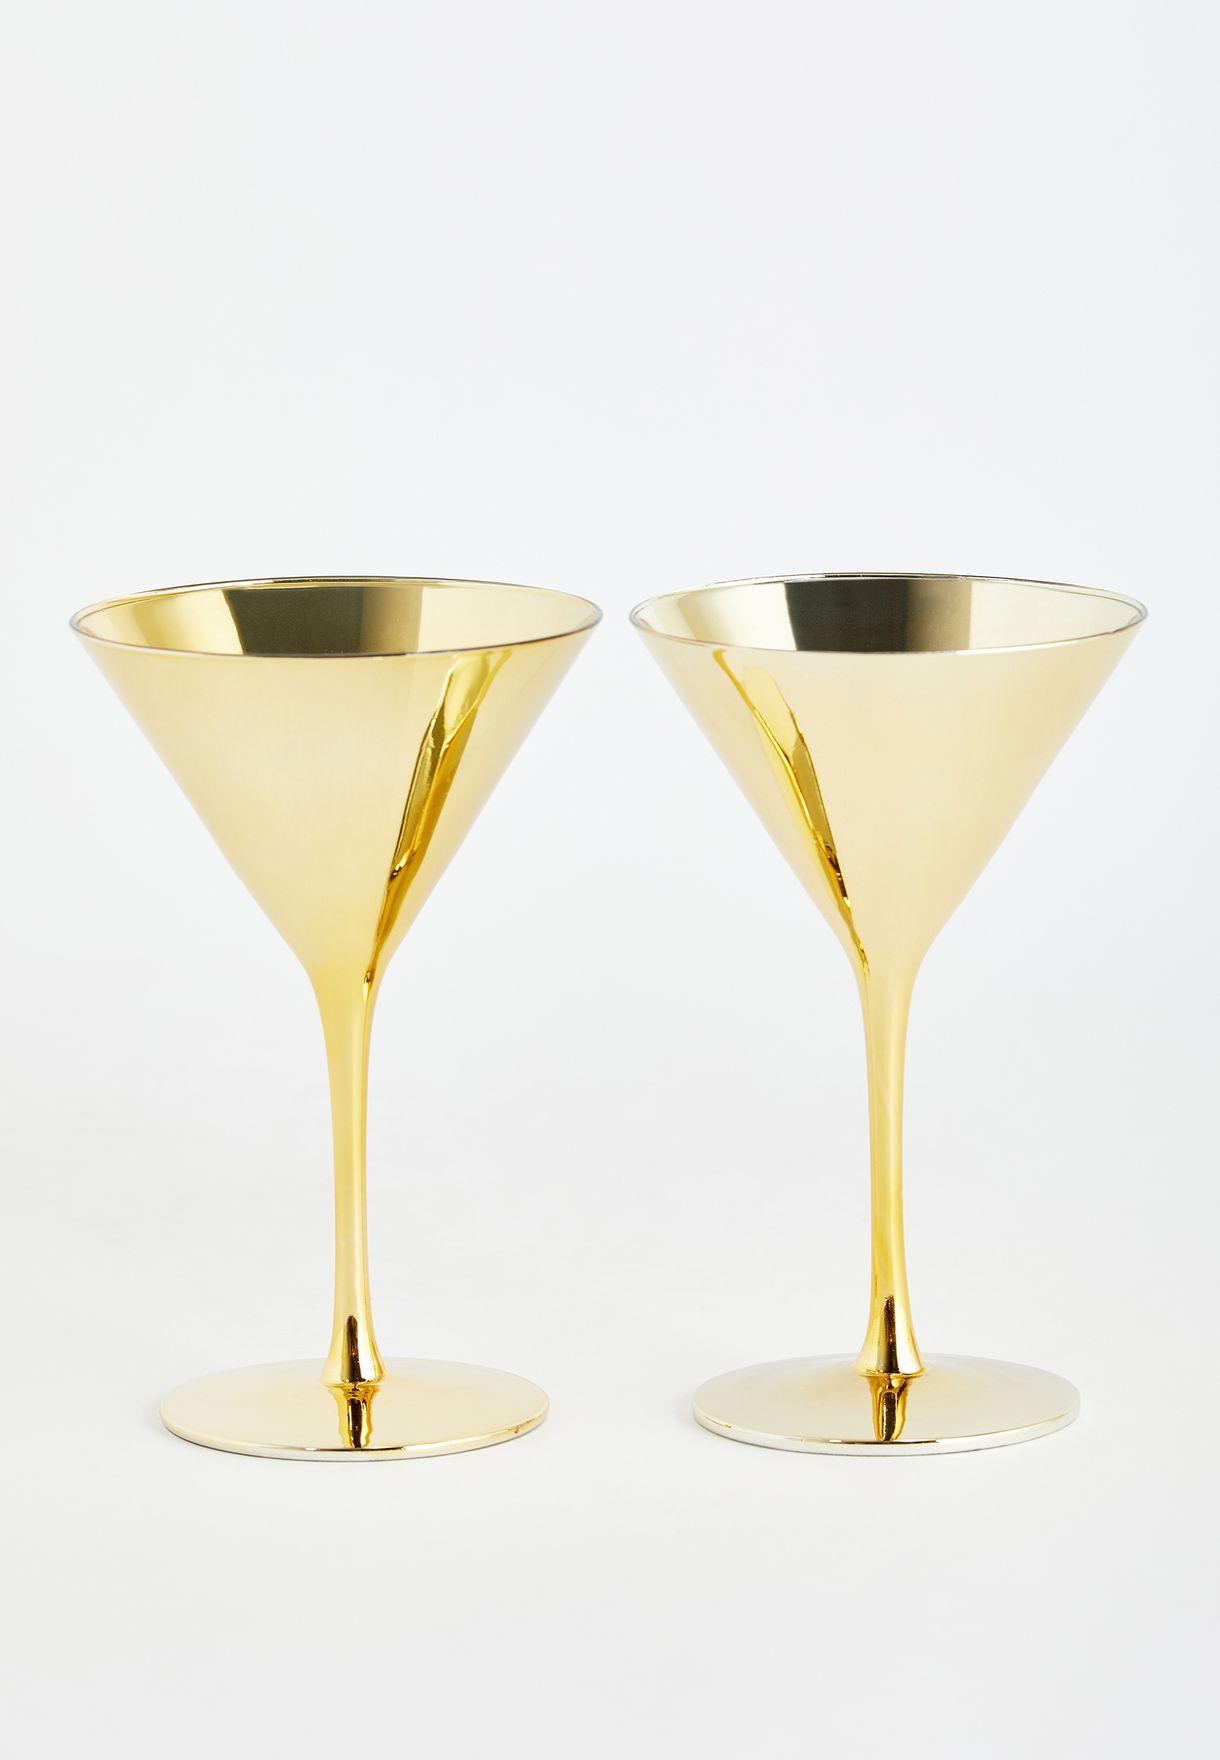 Set of 2 Gold Glasses